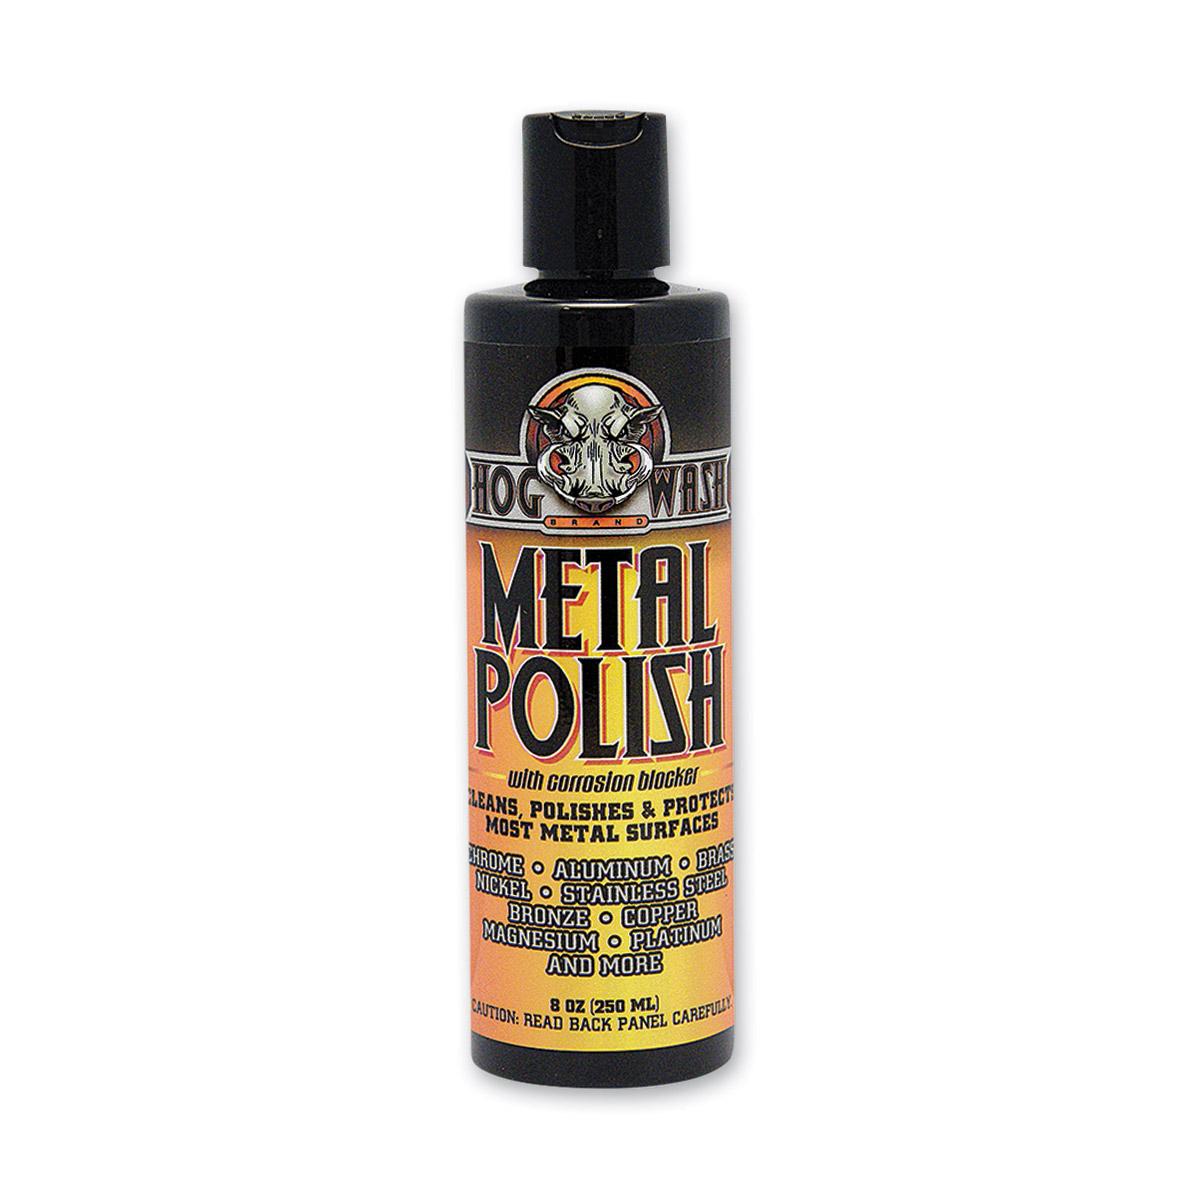 Hog Wash Metal Polish